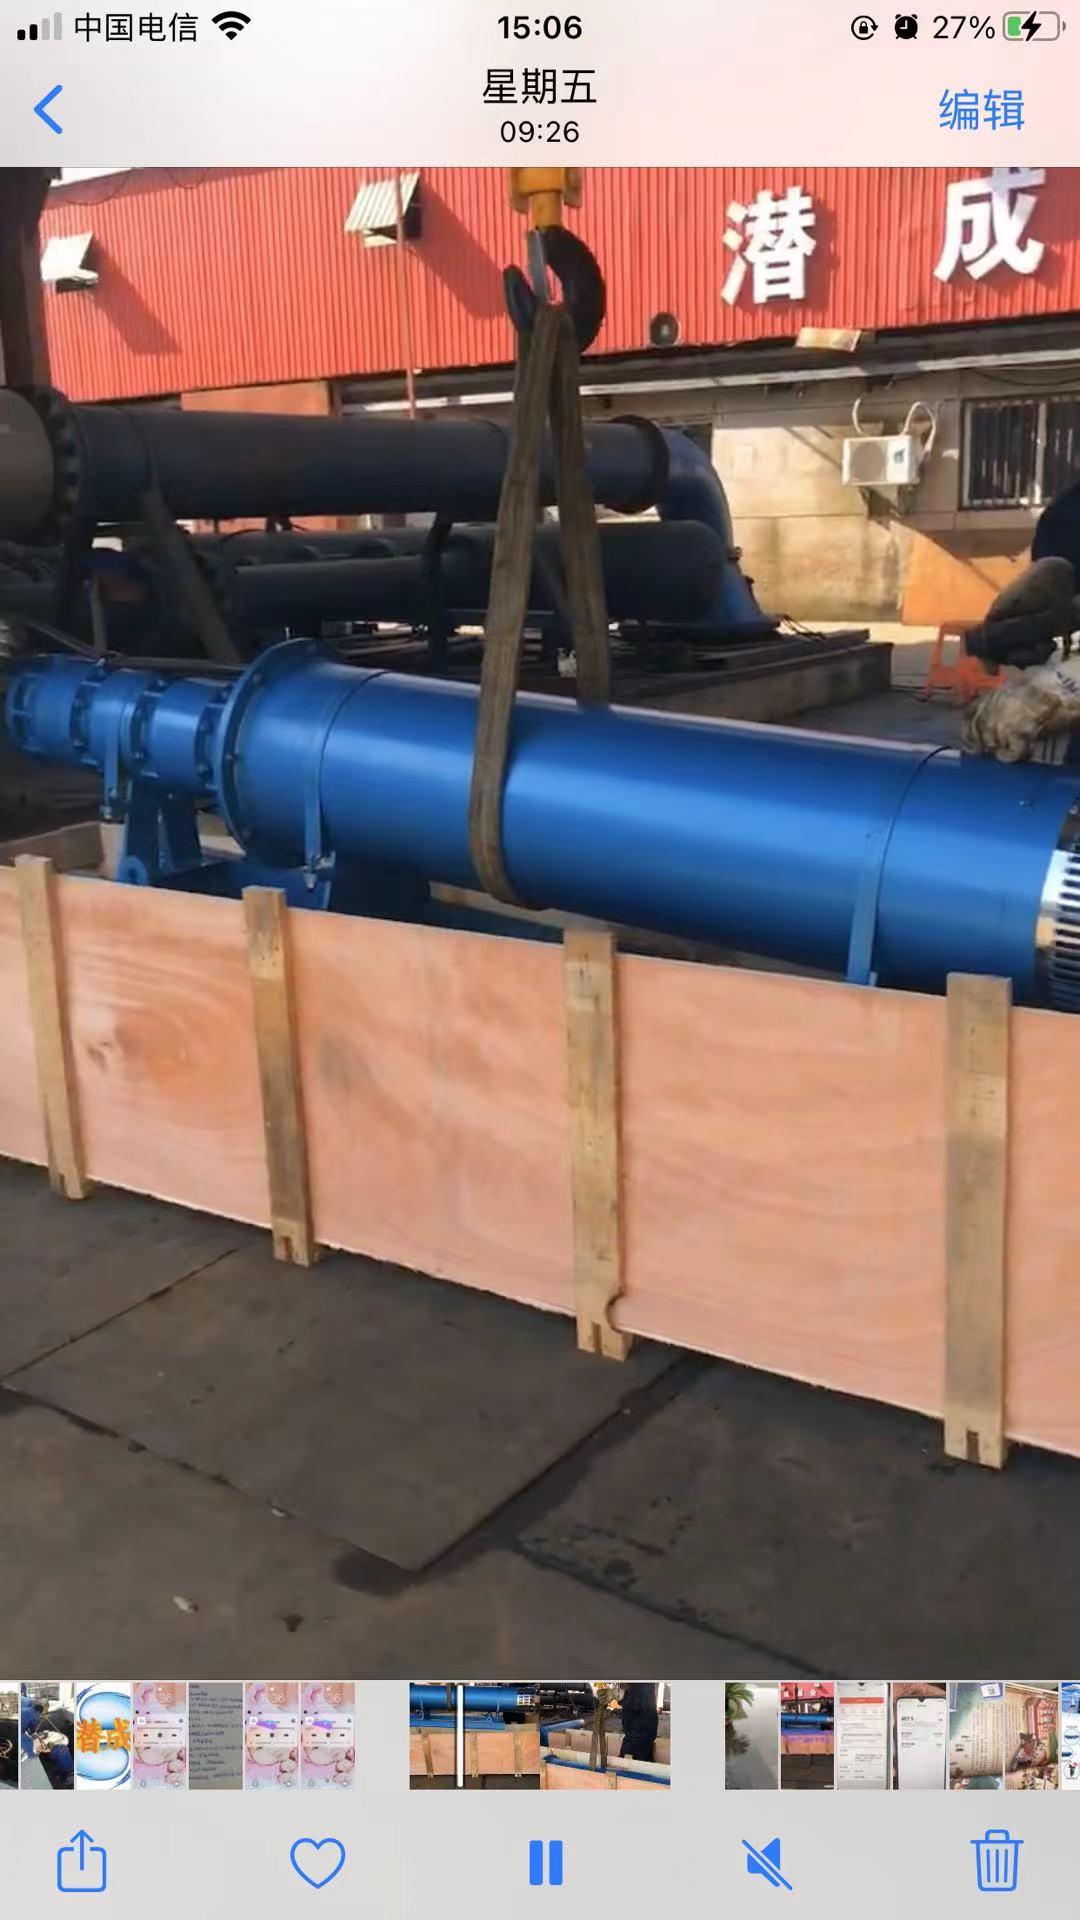 250QJW80-200-75KW发往北京第2张-潜水电机-潜水电泵-高压潜水电机-天津潜成泵业